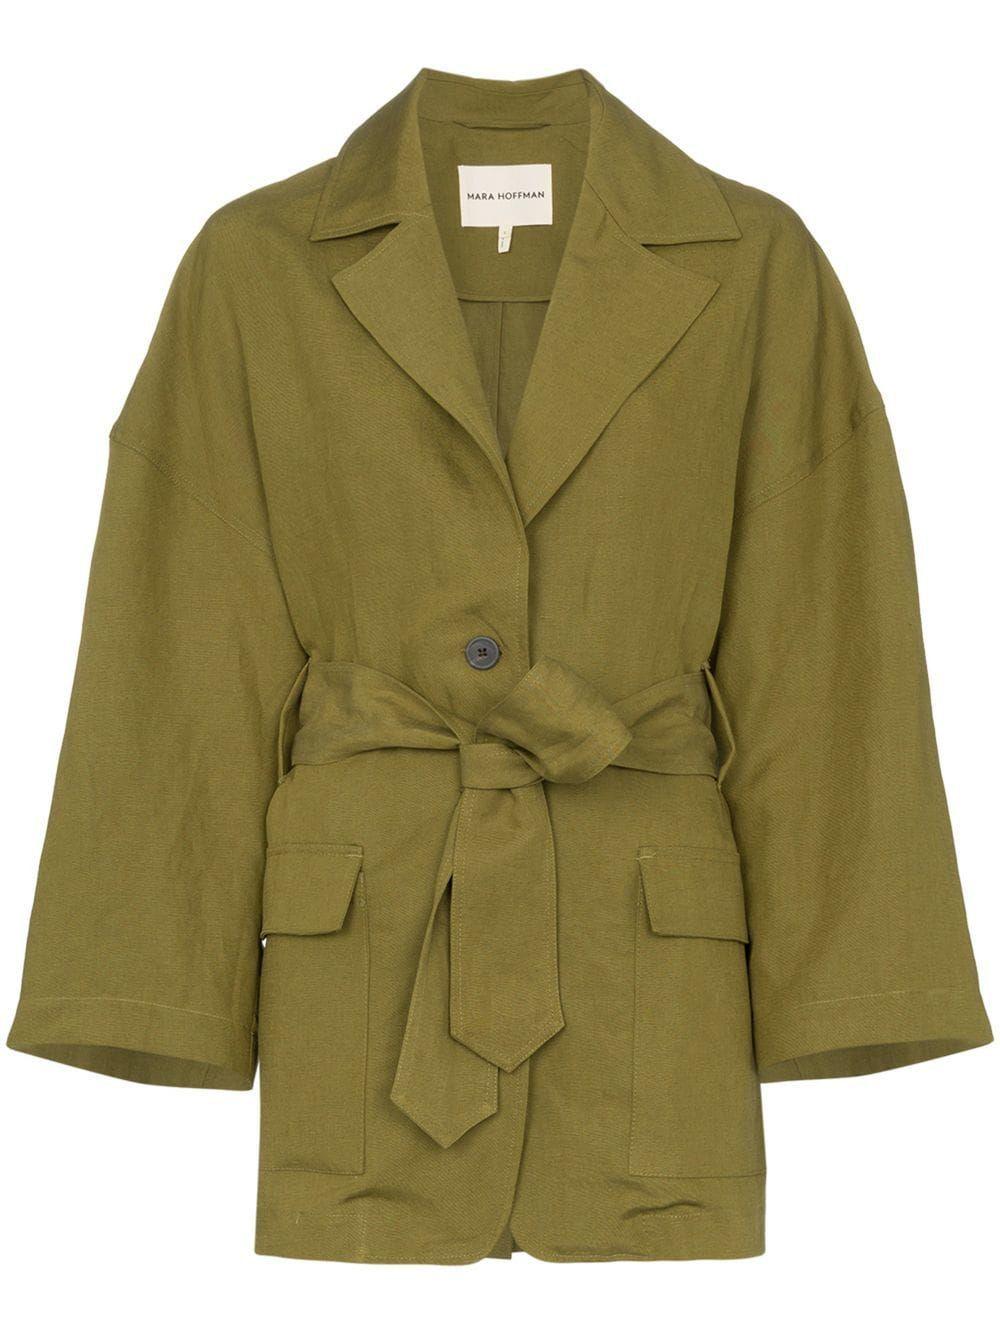 Atticus Jacket Mara Hoffman marahoffman.com $425.00 SHOP NOW The sleekest utility jacket we ever did see.